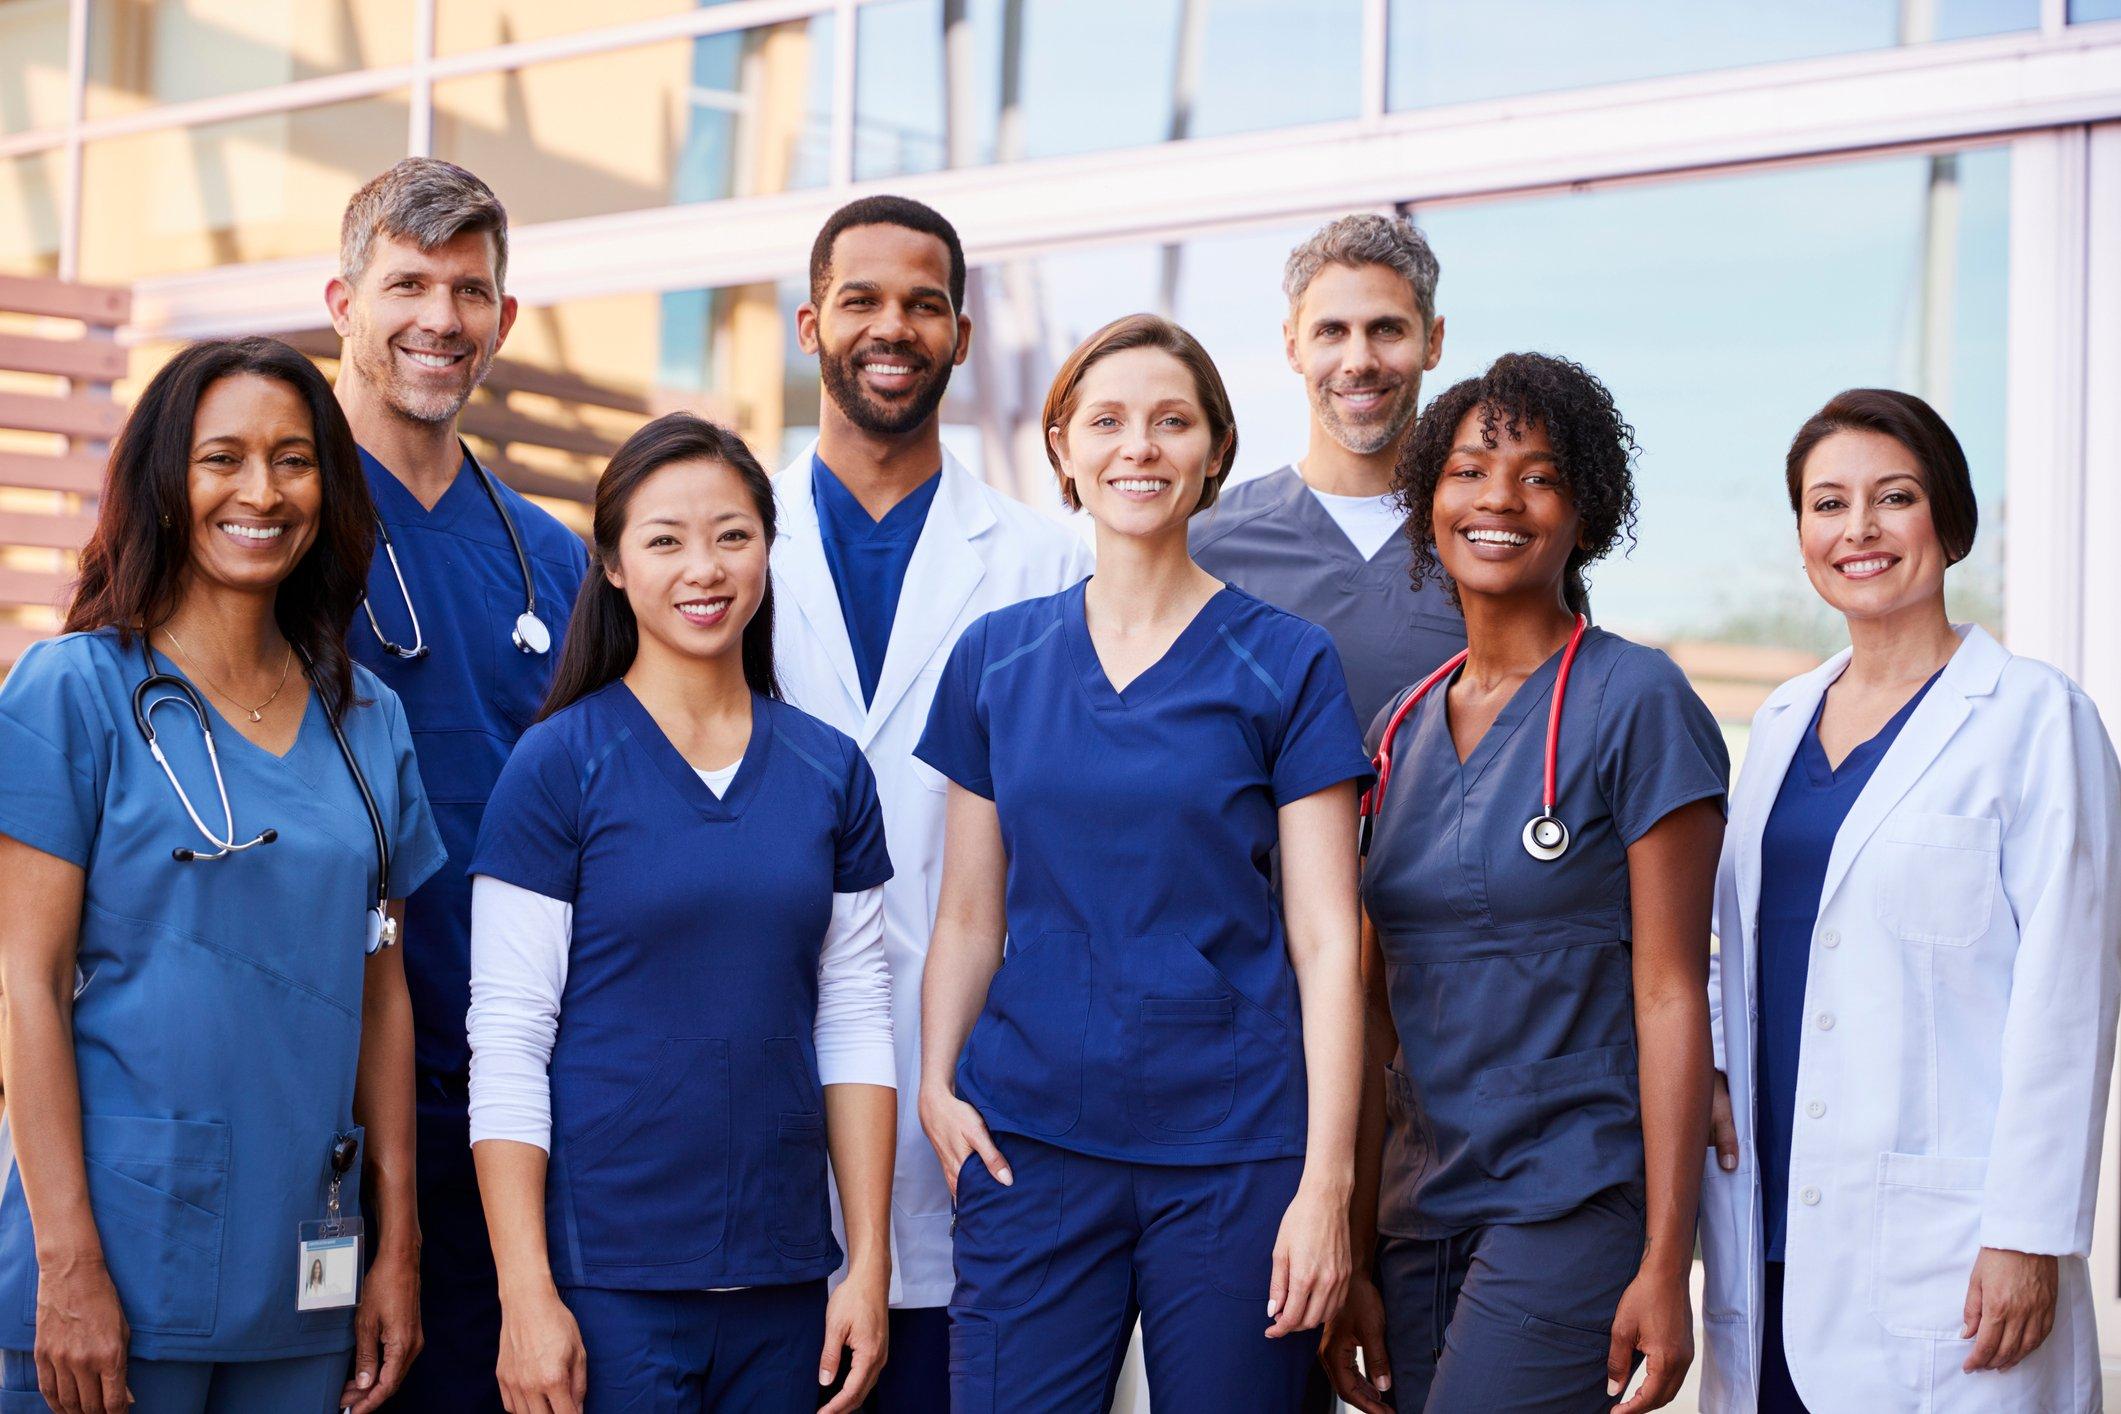 team-based-medical-care